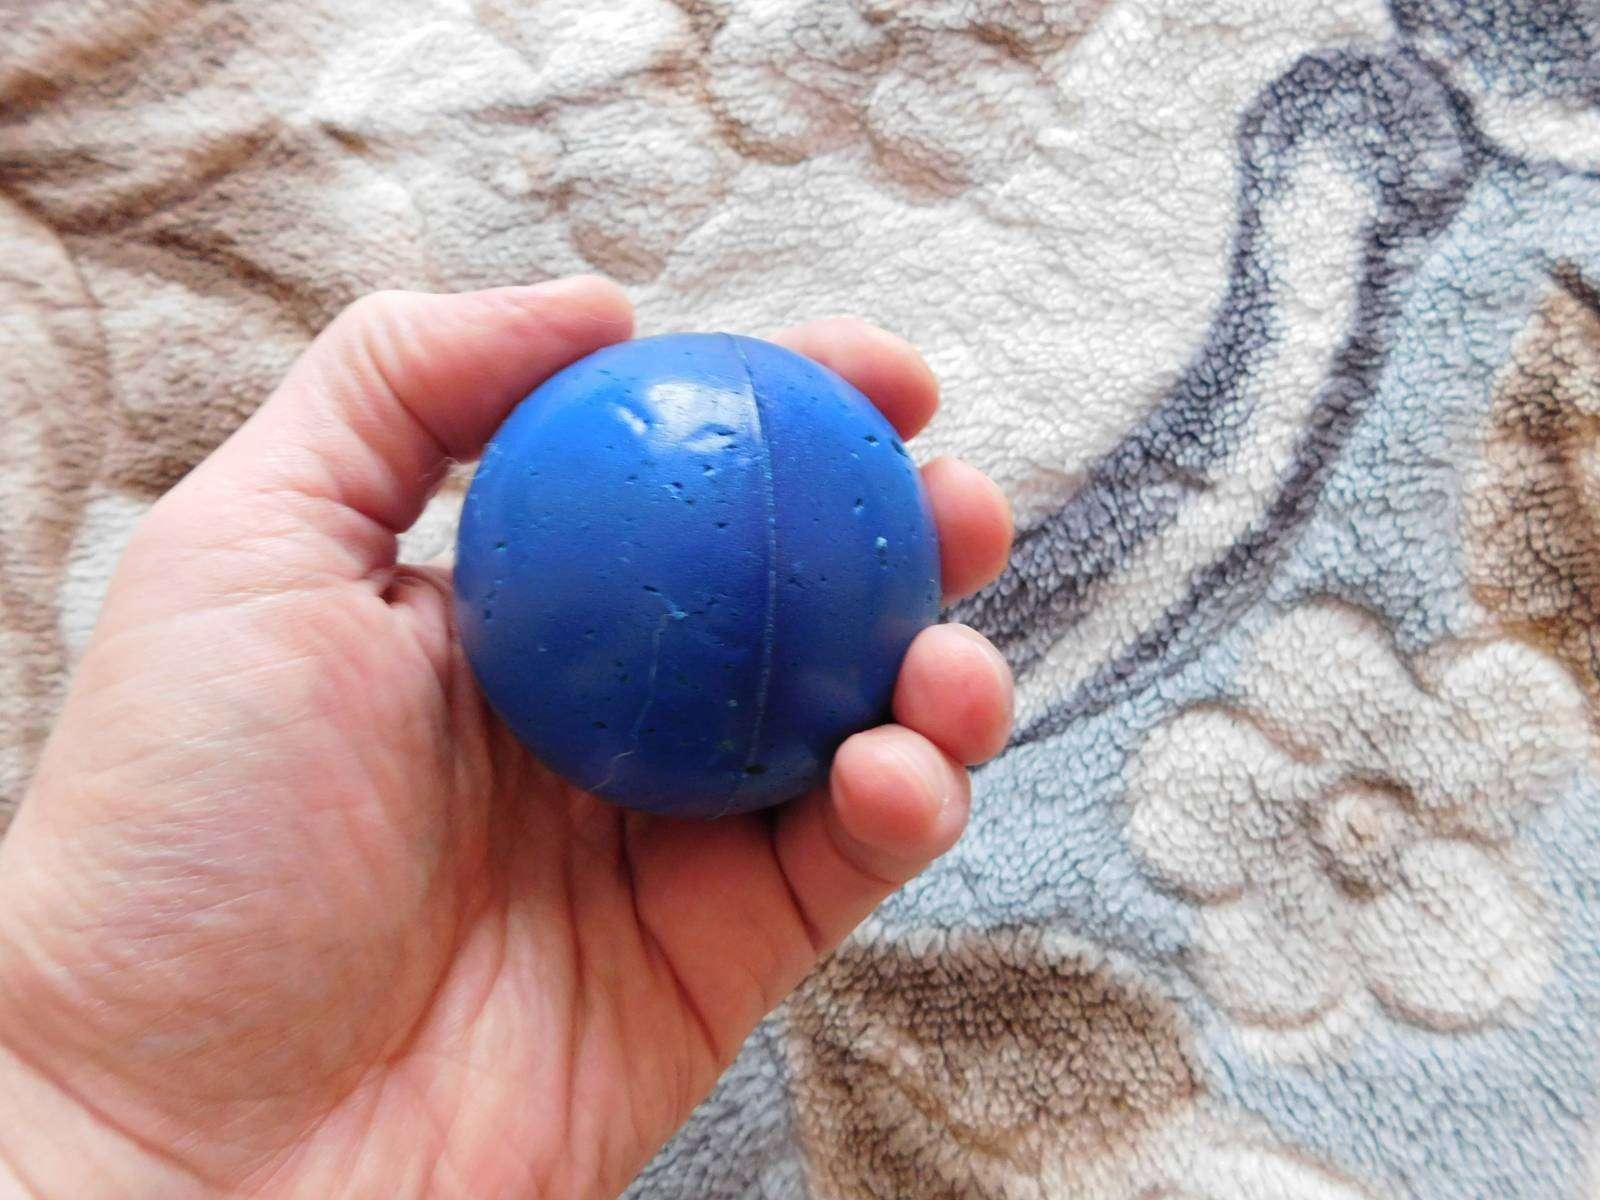 GearBest: Антистресс-игрушка для кота